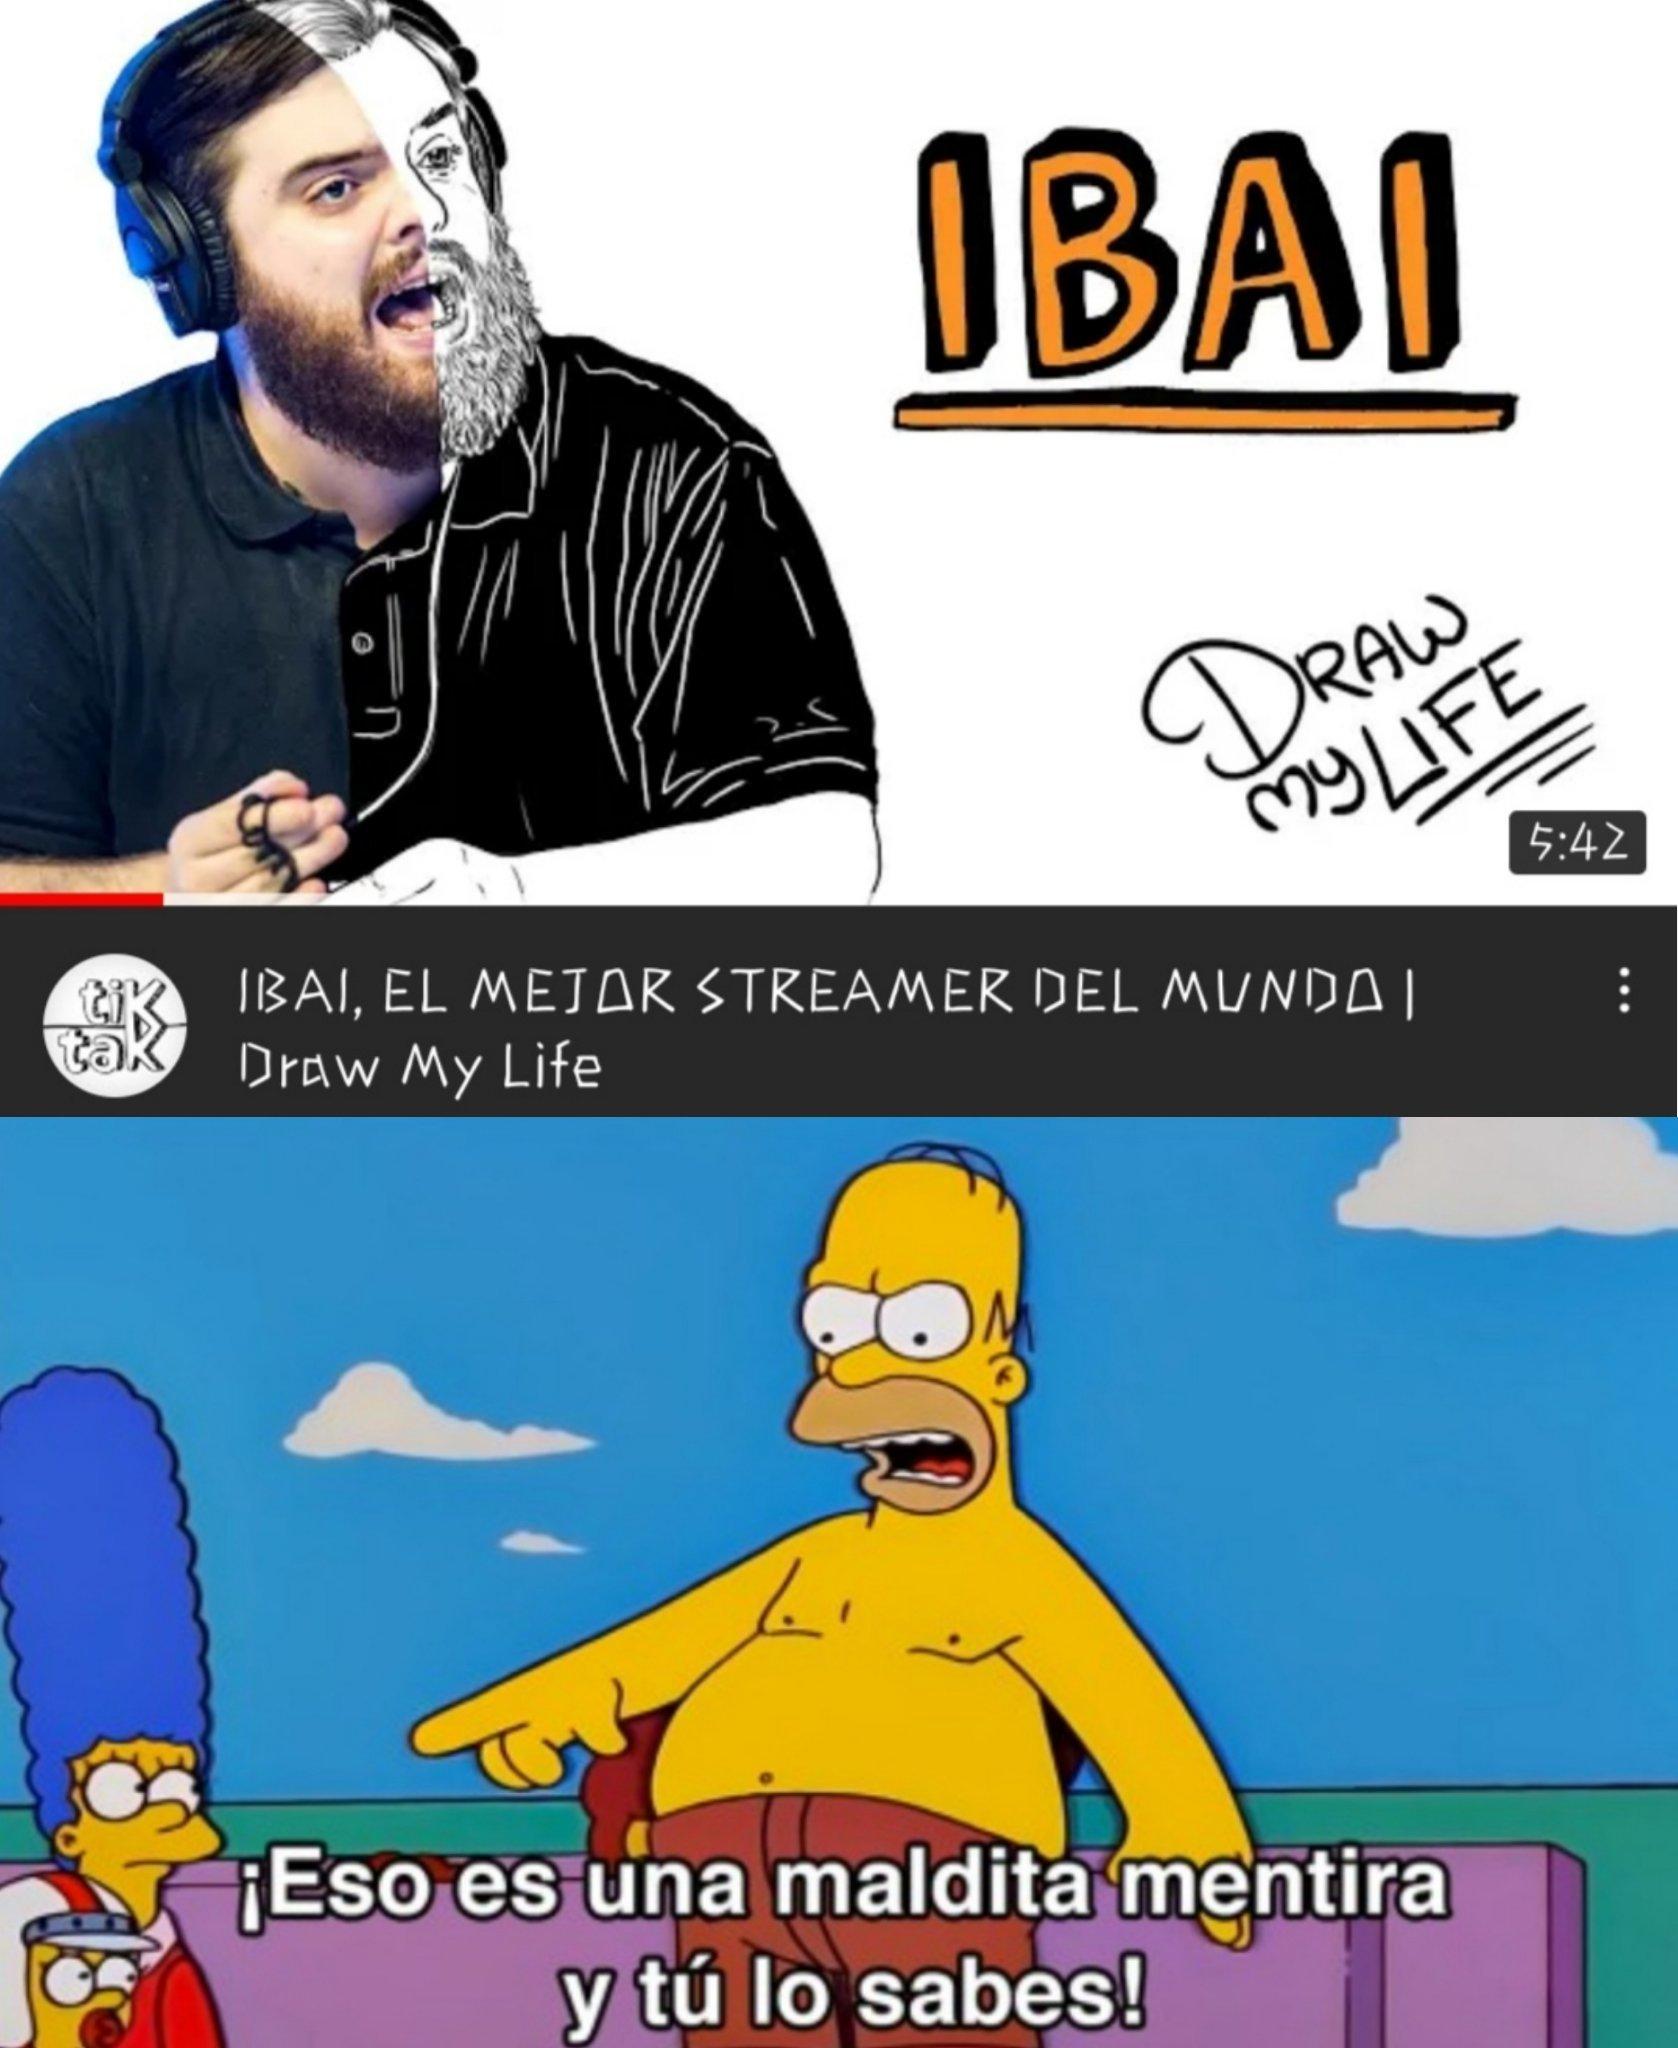 Ibai el mejor streamer xd - meme